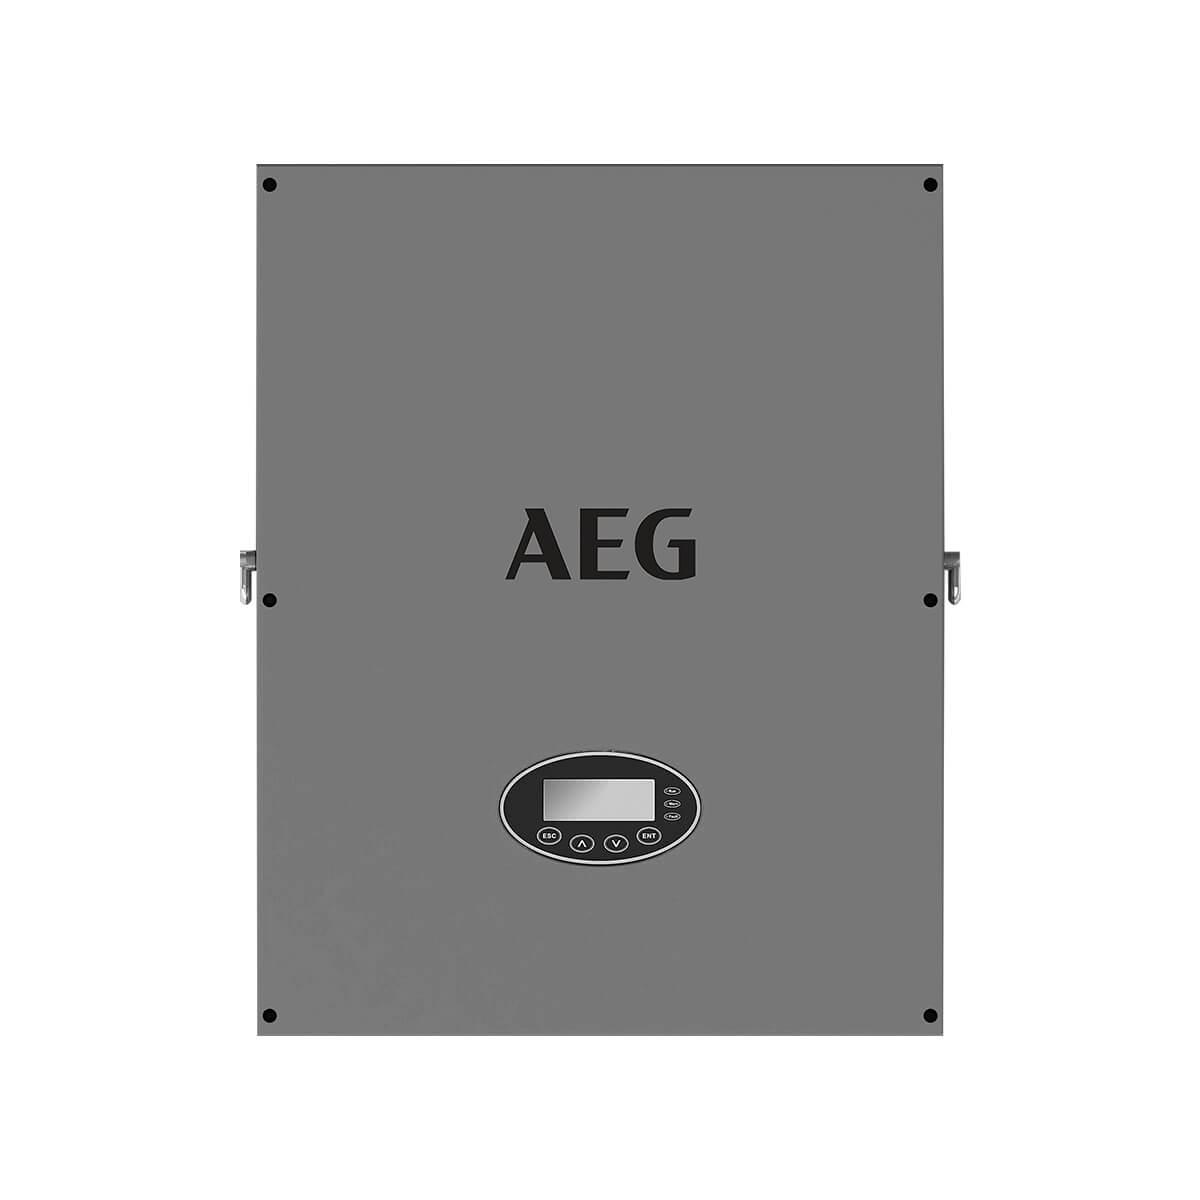 aeg 33kW inverter, aeg as-ic01 33kW inverter, aeg as-ic01-33000-2 inverter, aeg as-ic01-33000-2, aeg as-ic01 33kW